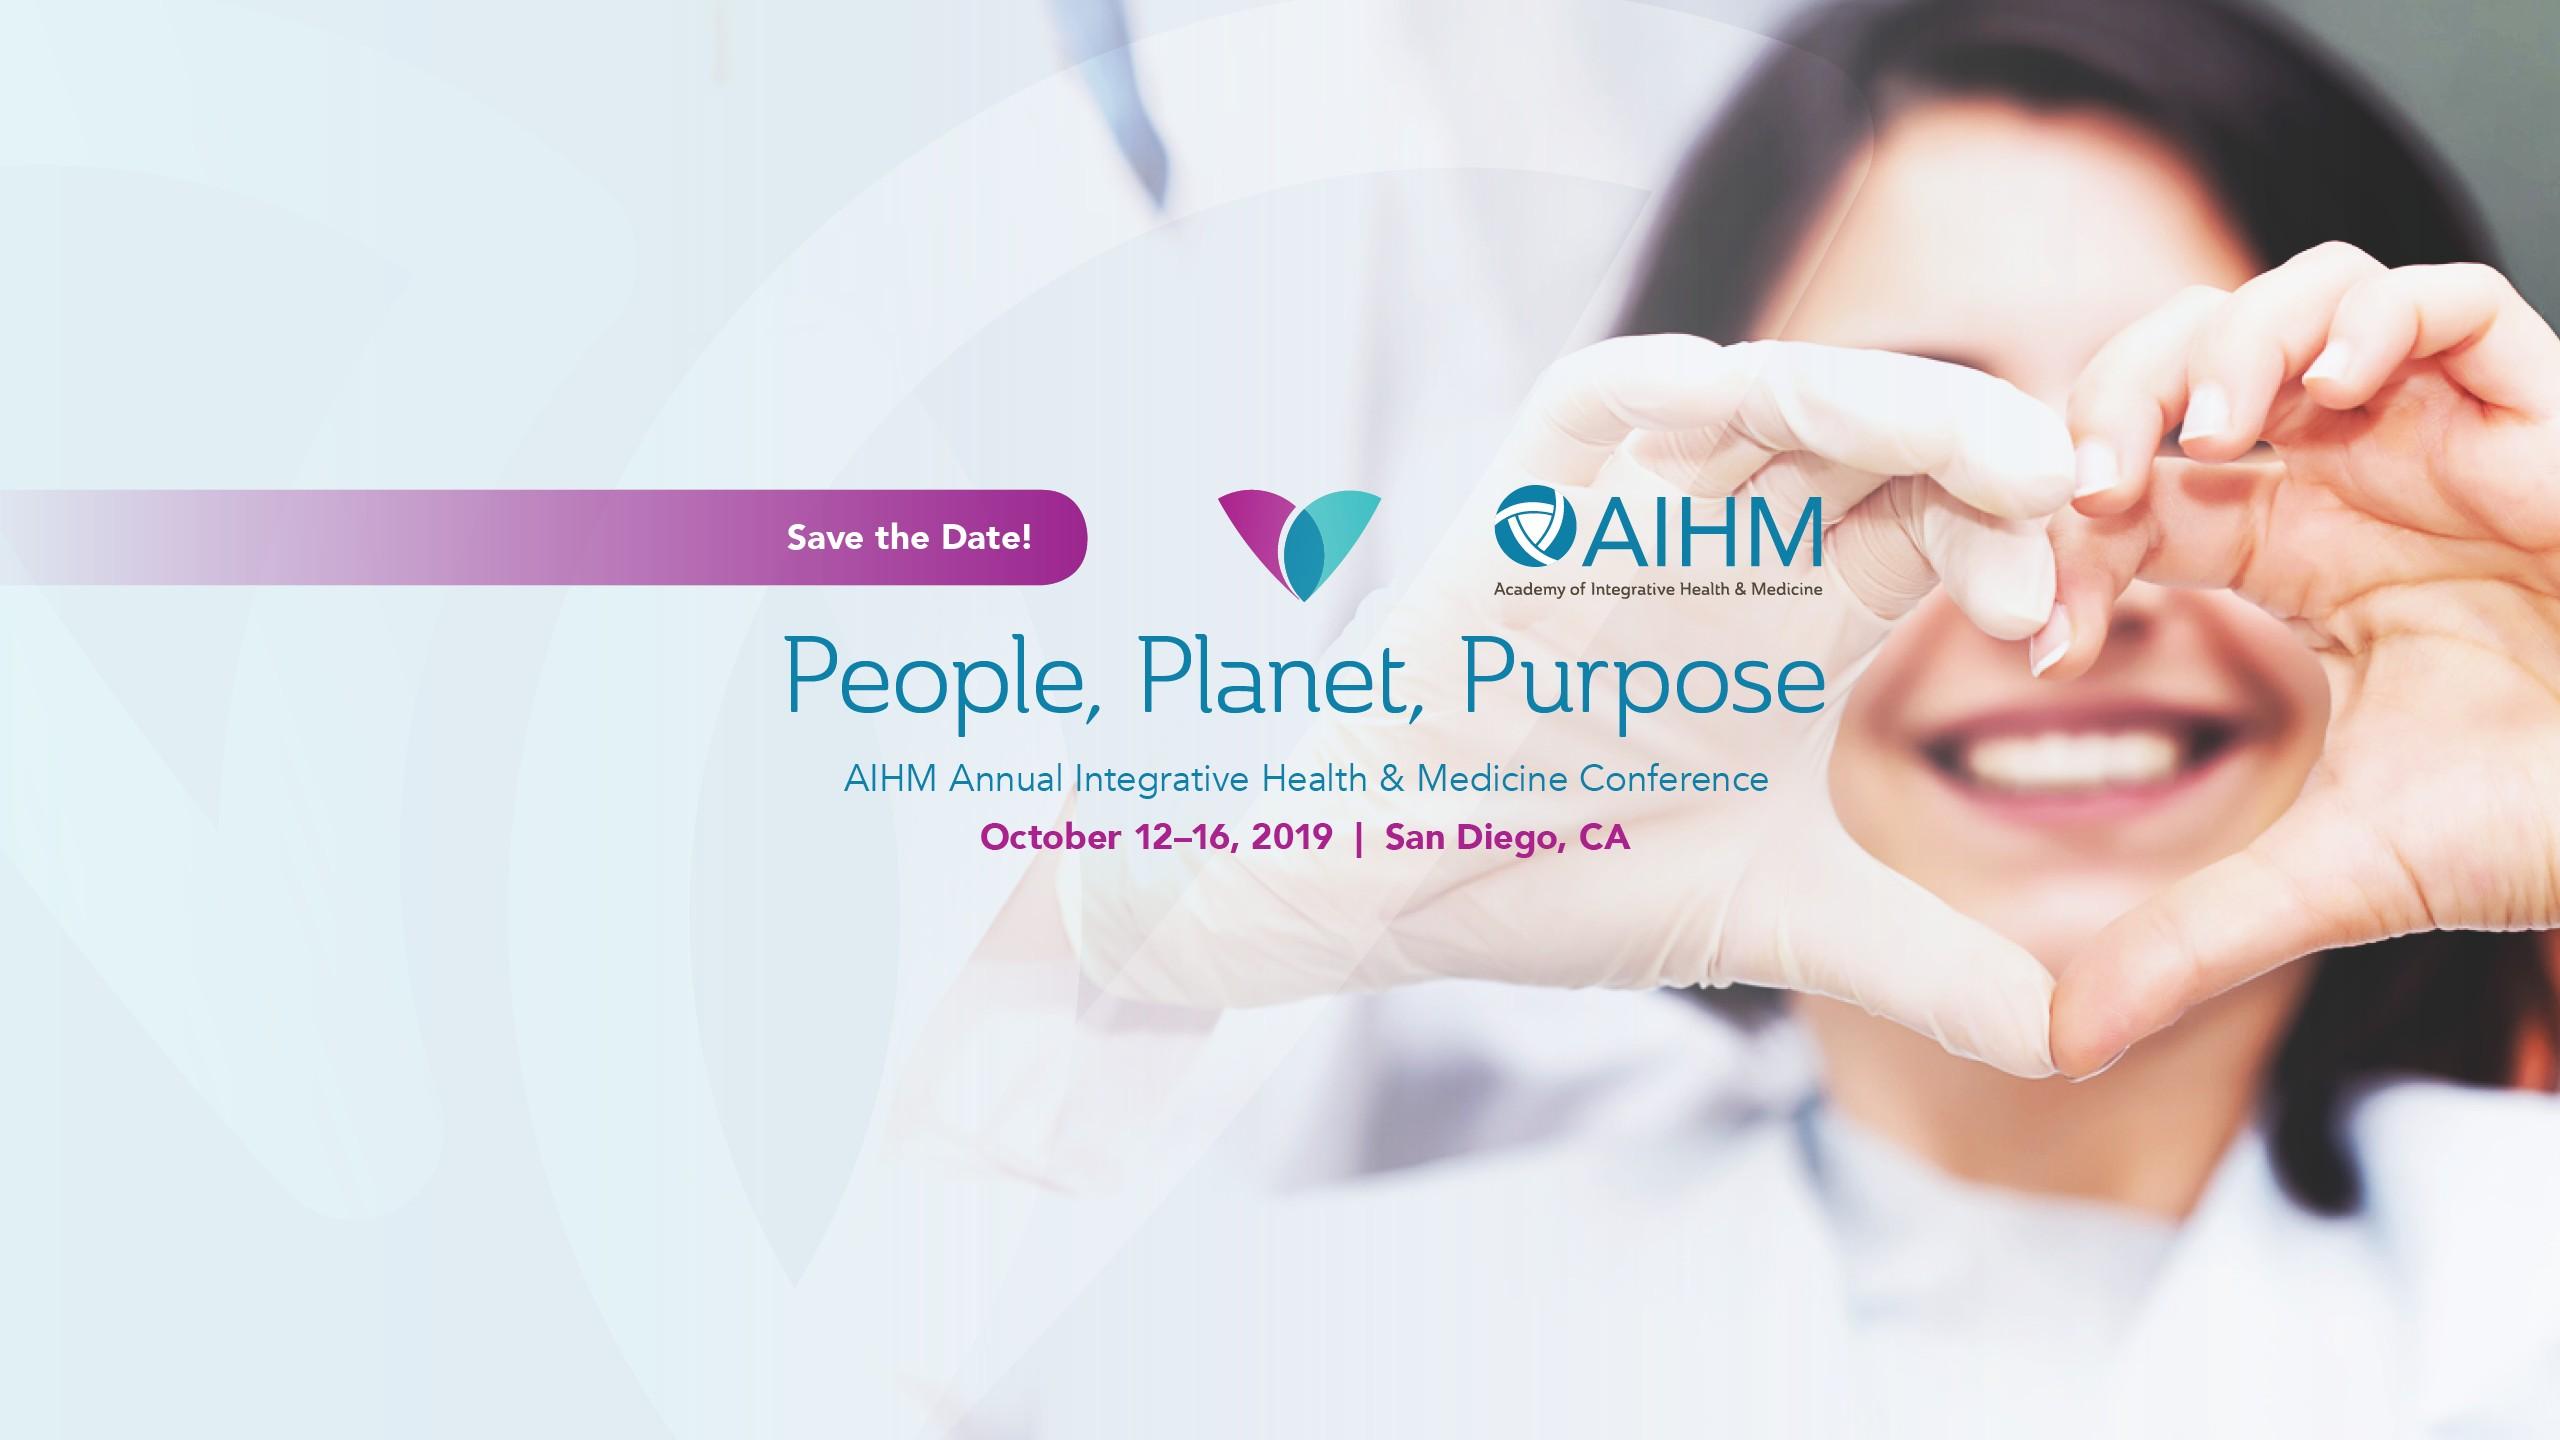 Academy of Integrative Health & Medicine (AIHM)   LinkedIn